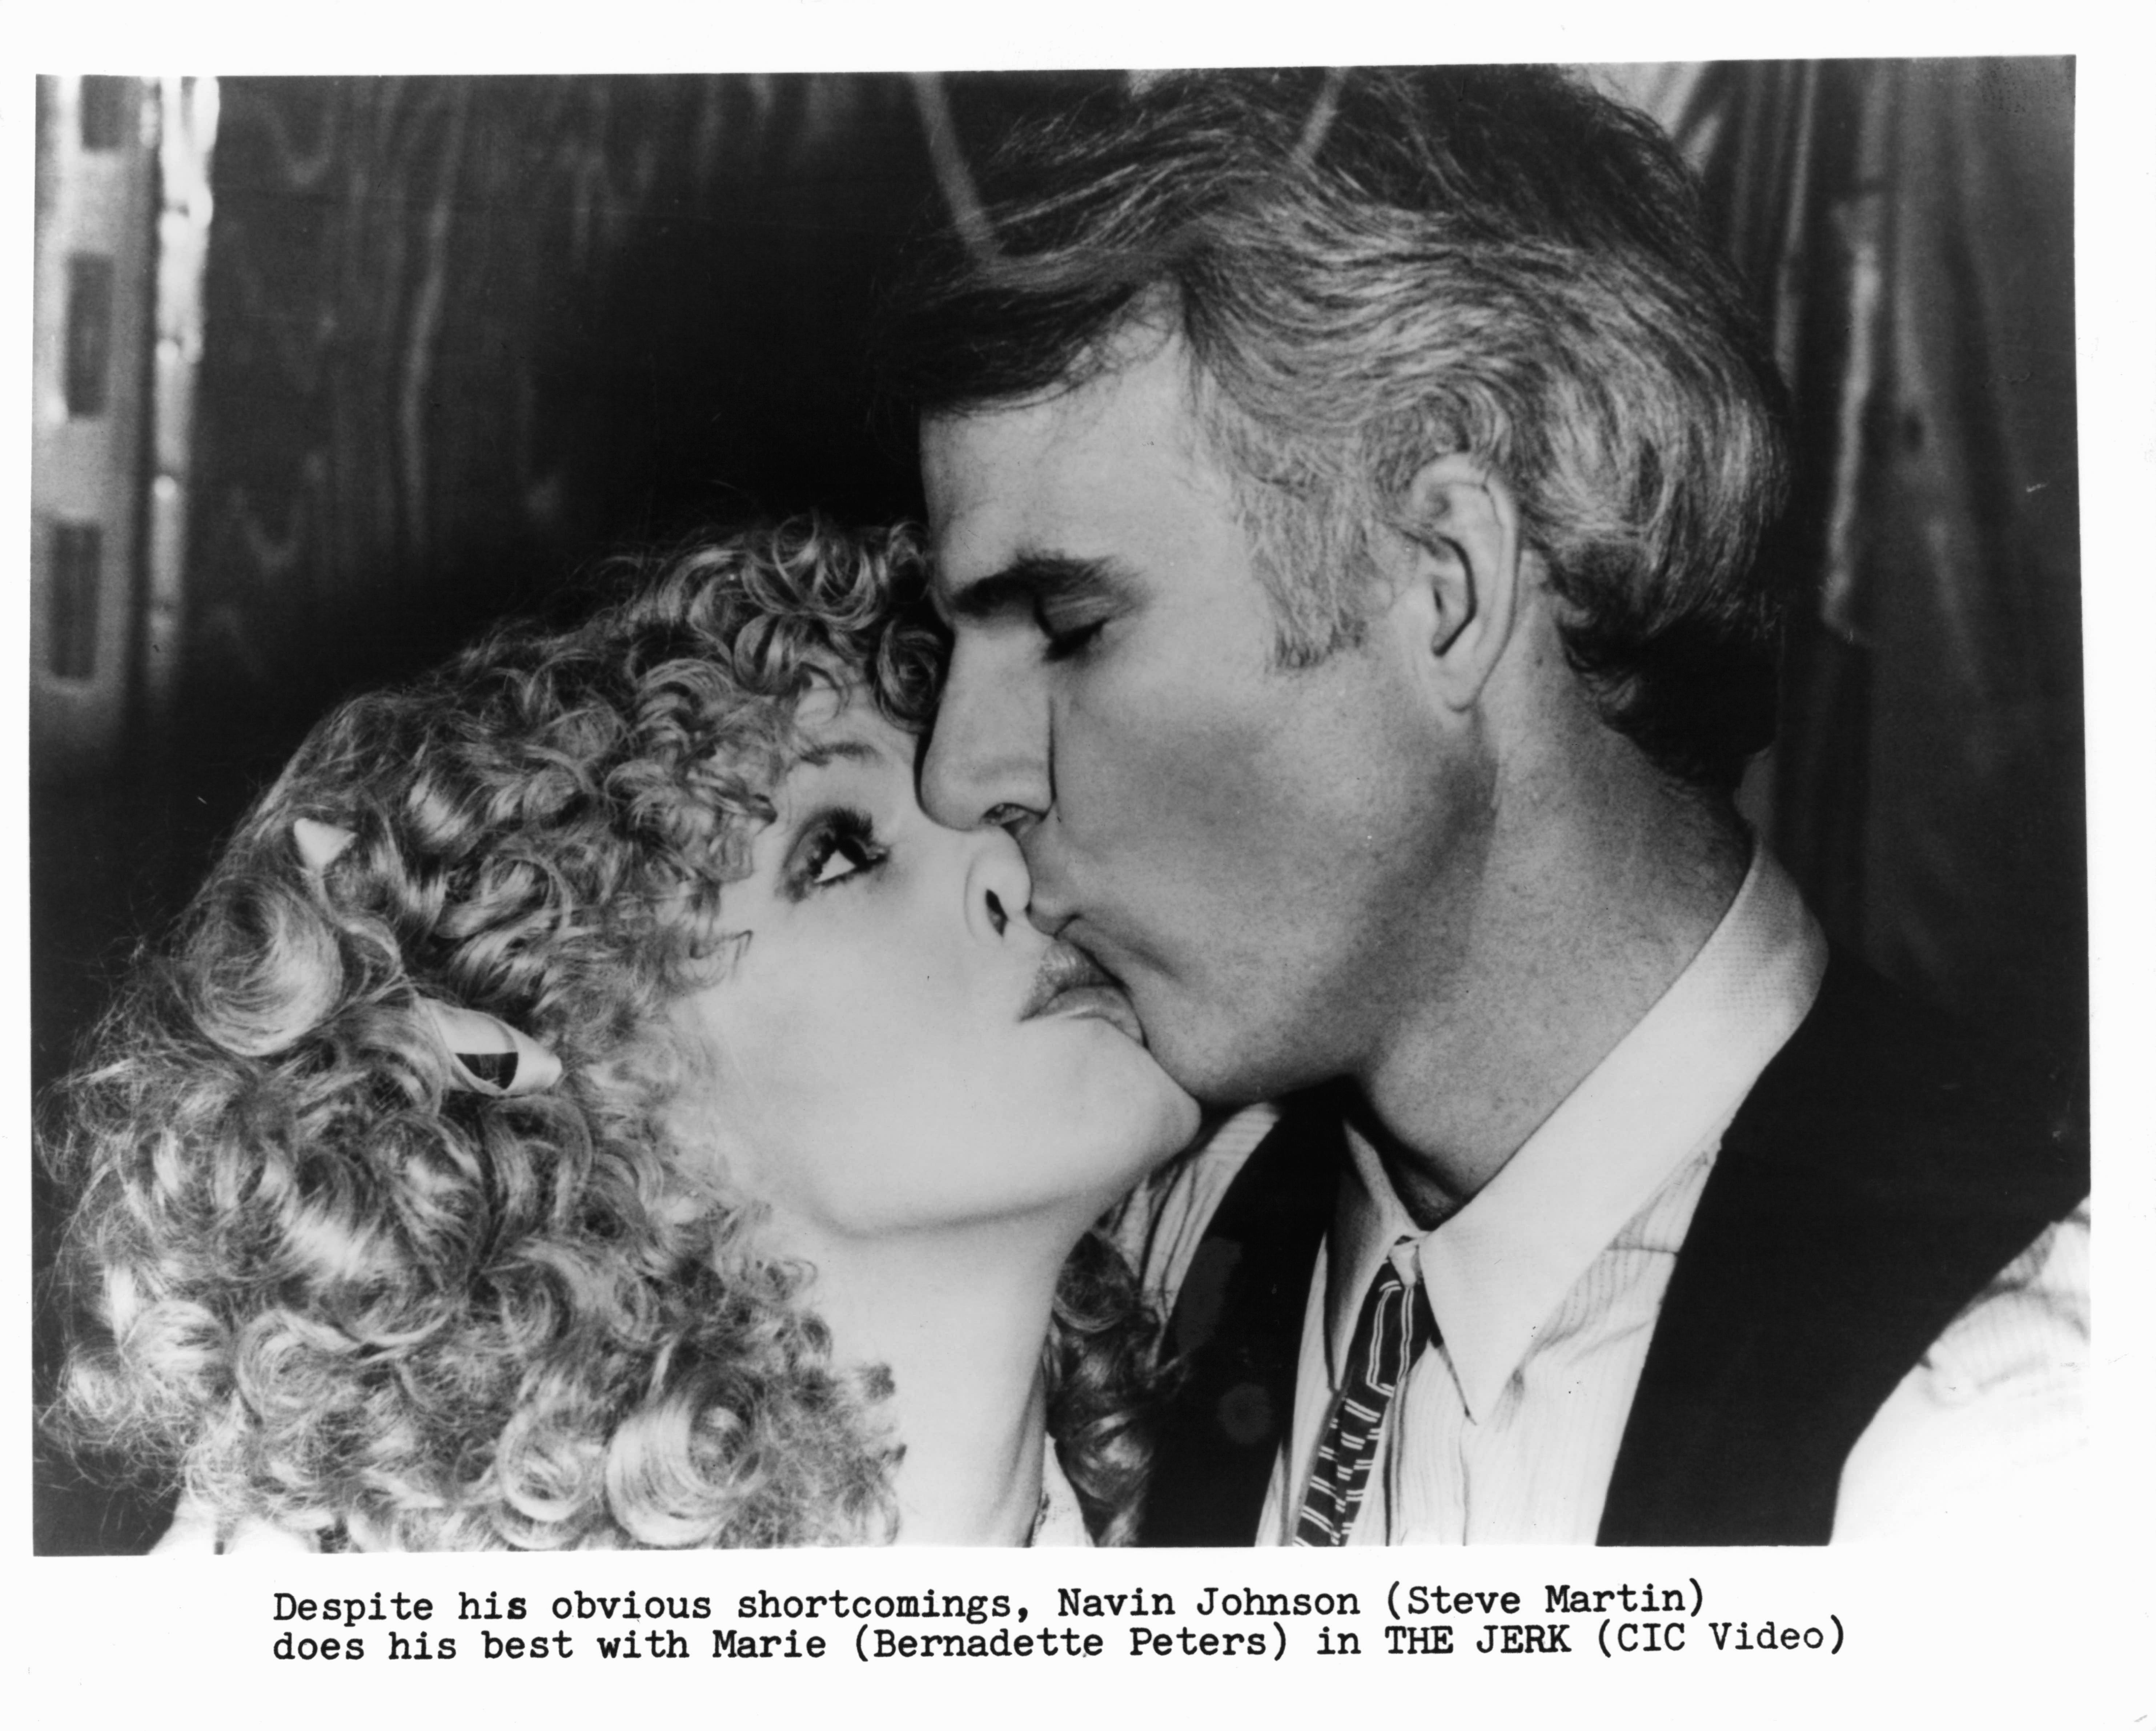 Steve Martin and Bernadette Peters in The Jerk (1979)